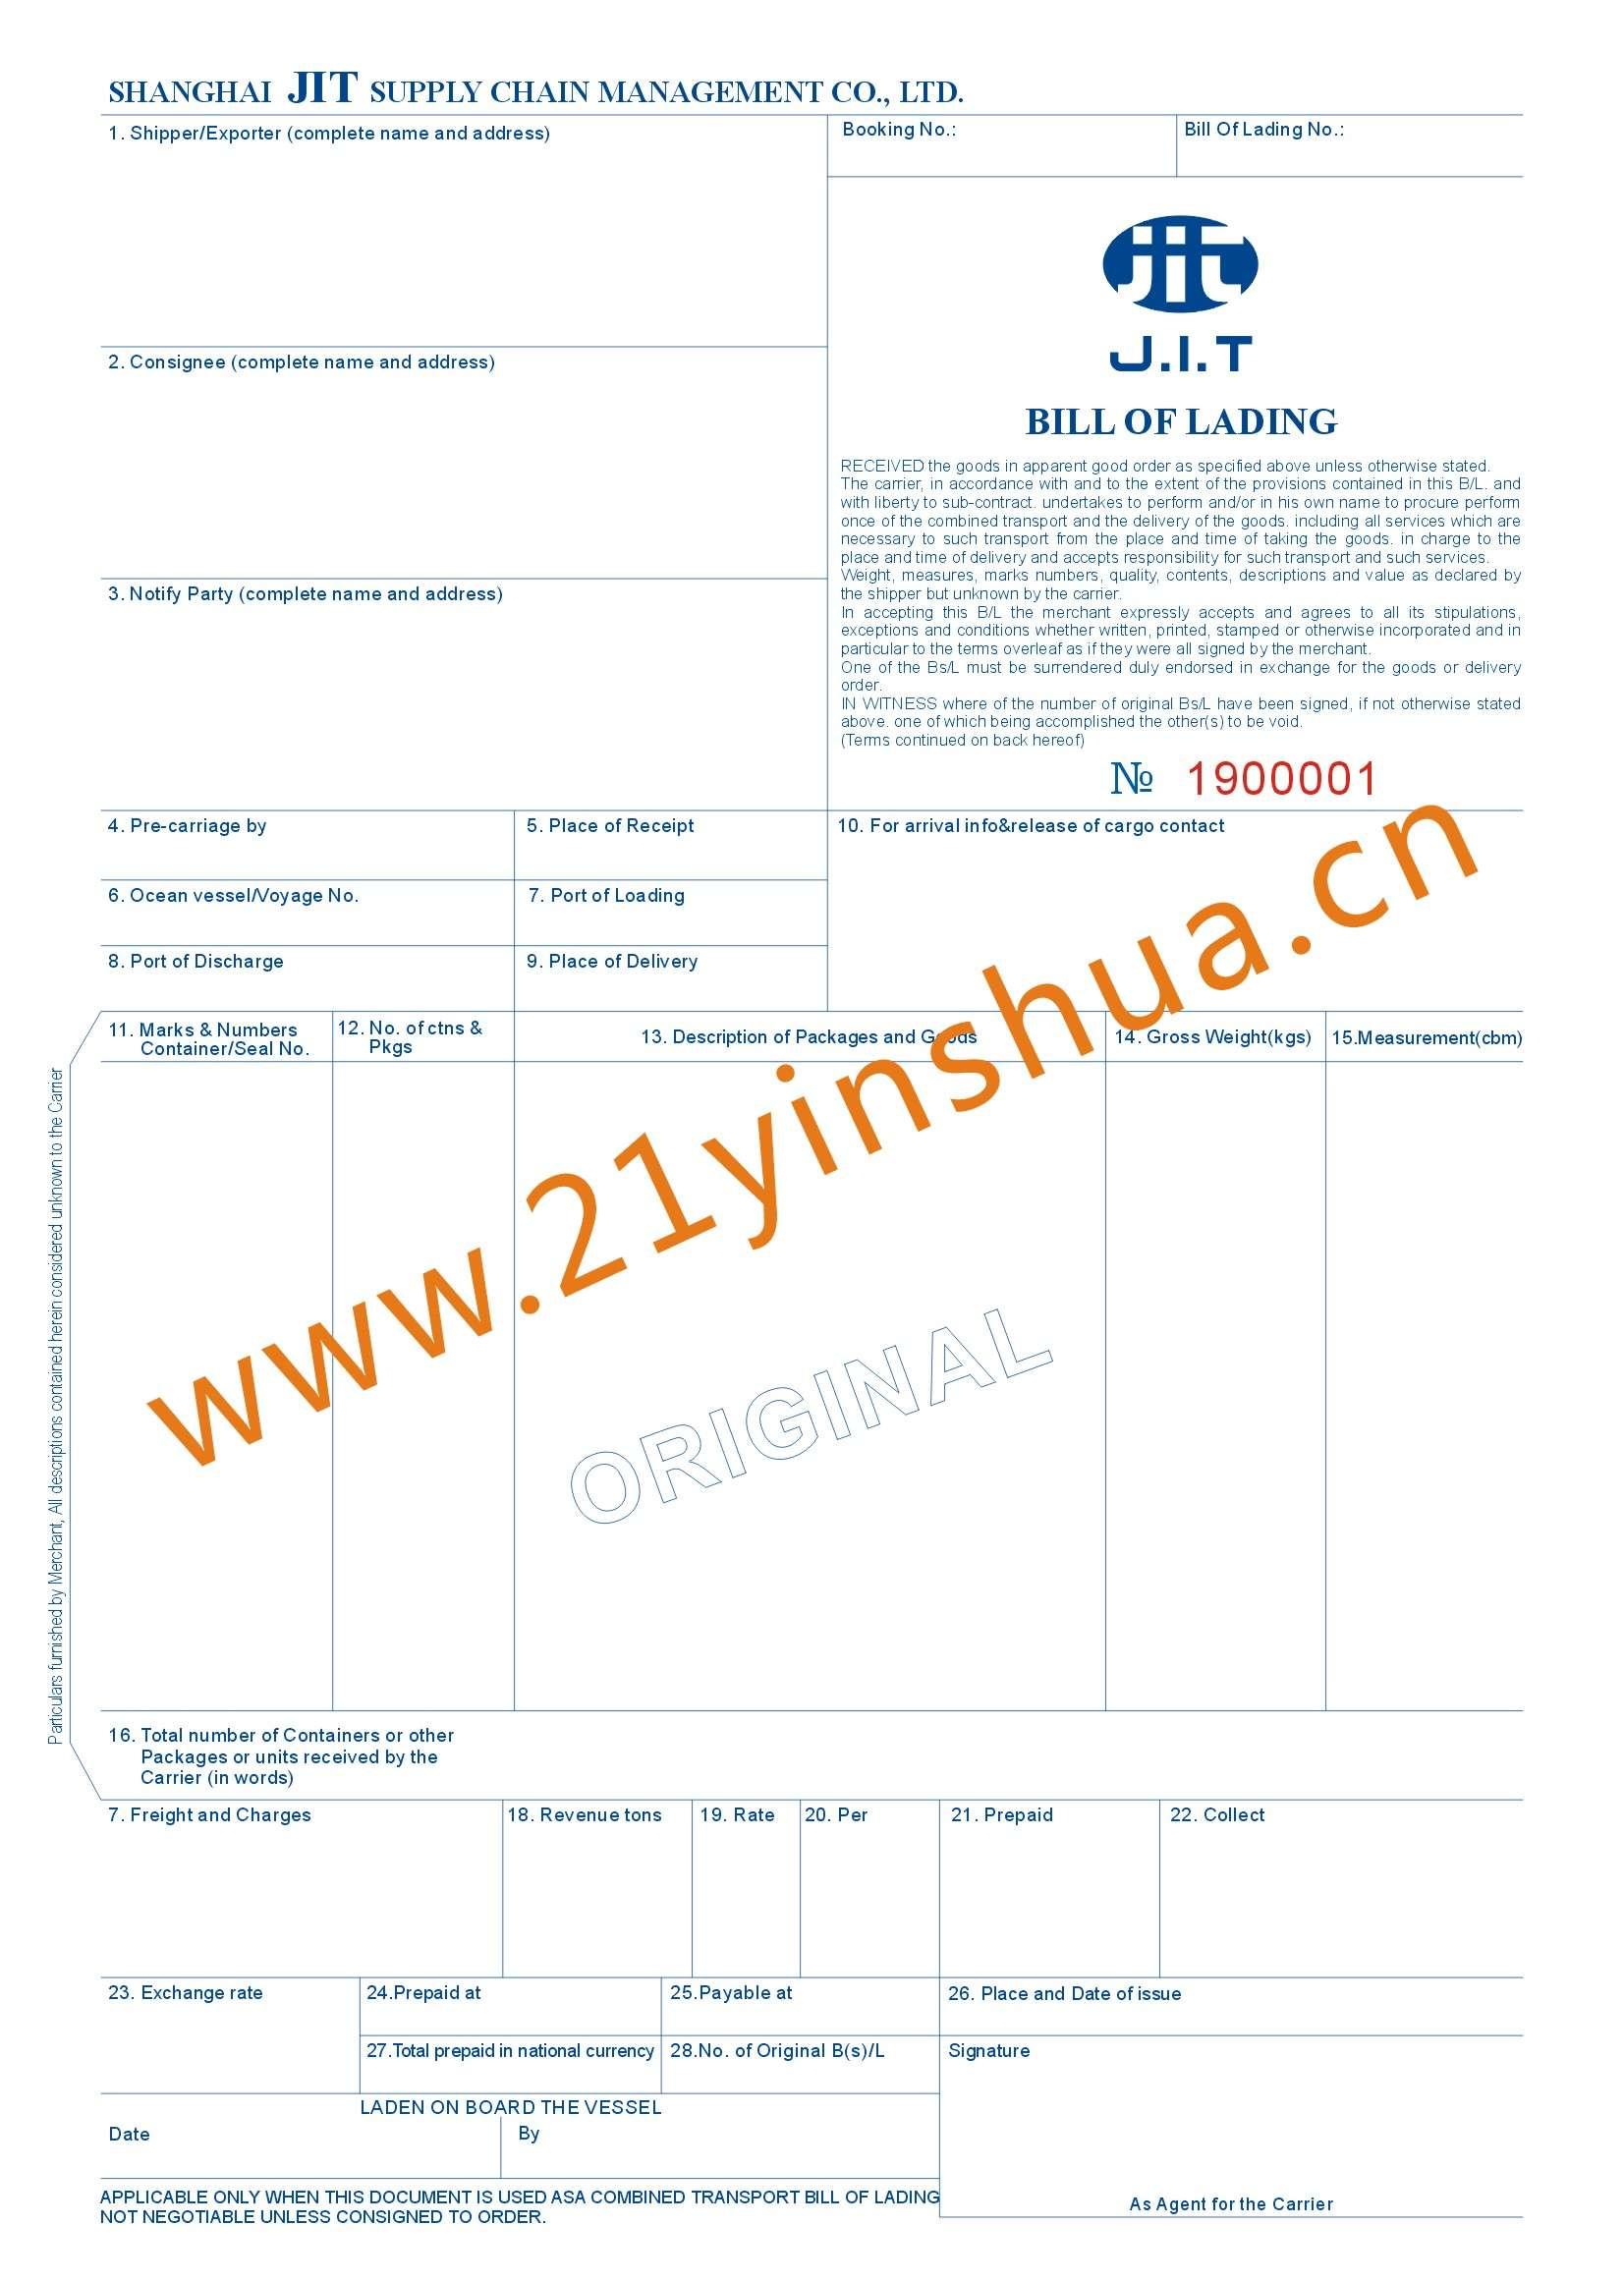 印刷定制海运提单SHANGHAI  JIT SUPPLY 成功案例